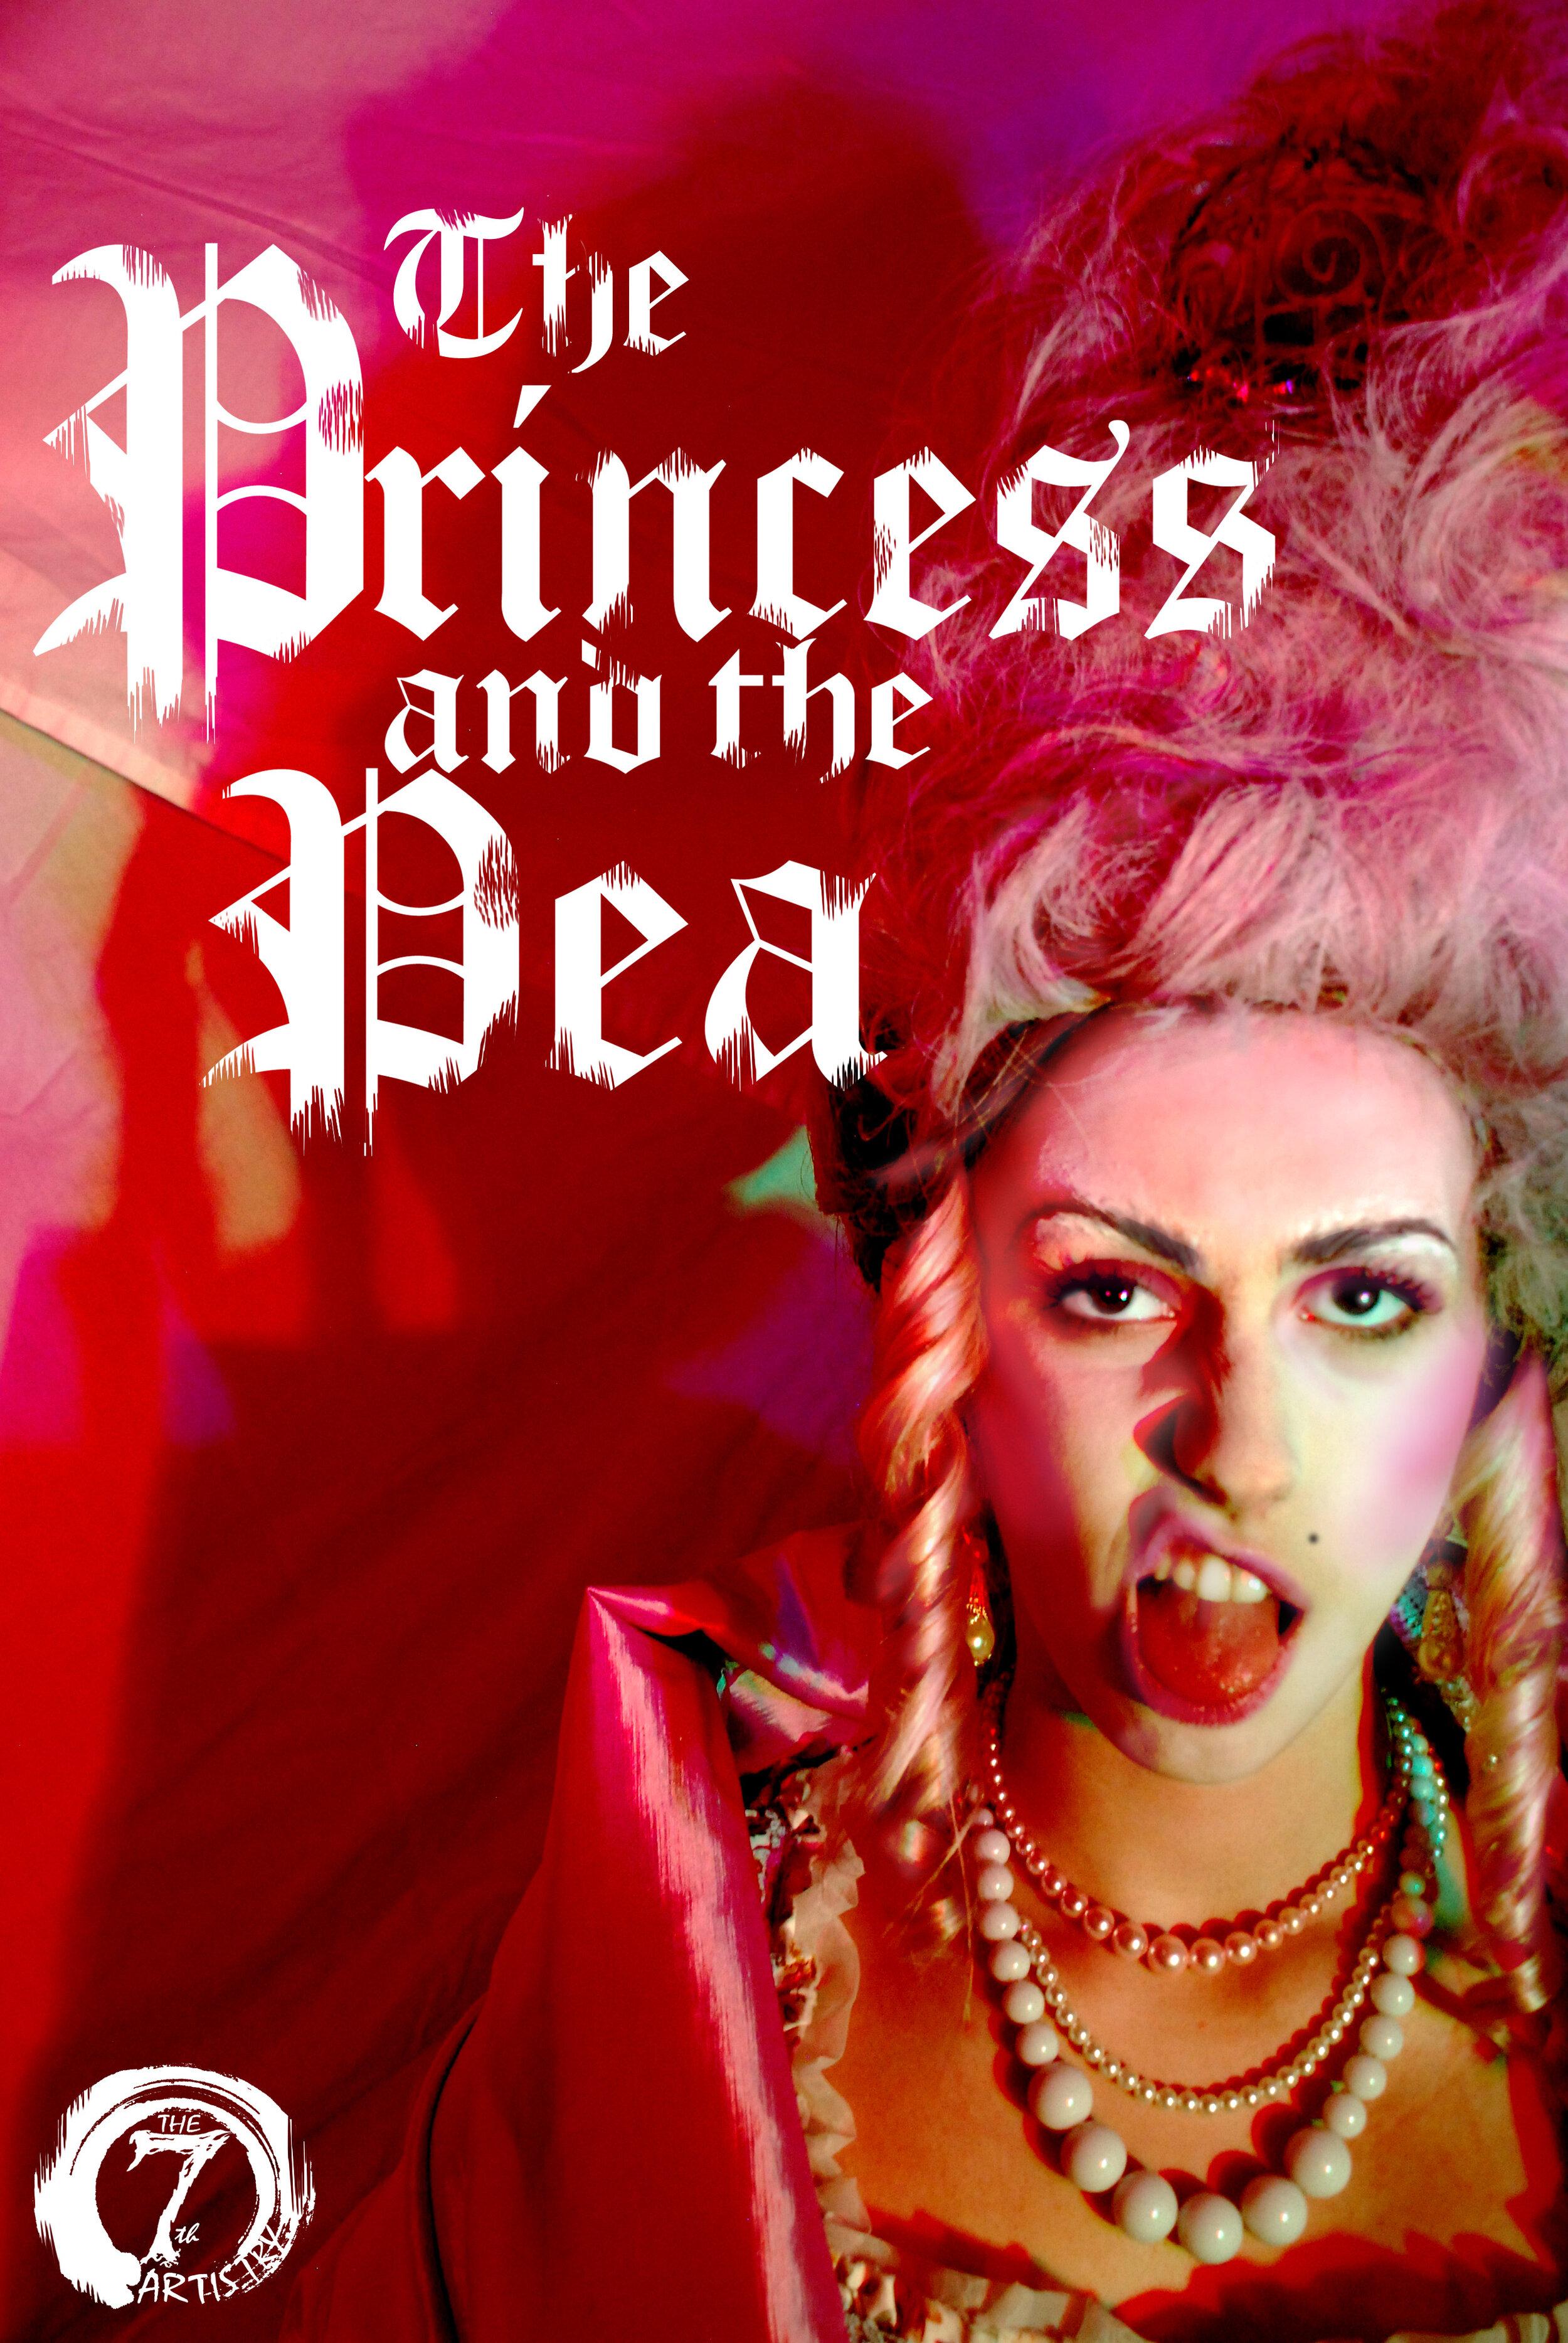 Princess and Pea promo 3.jpg